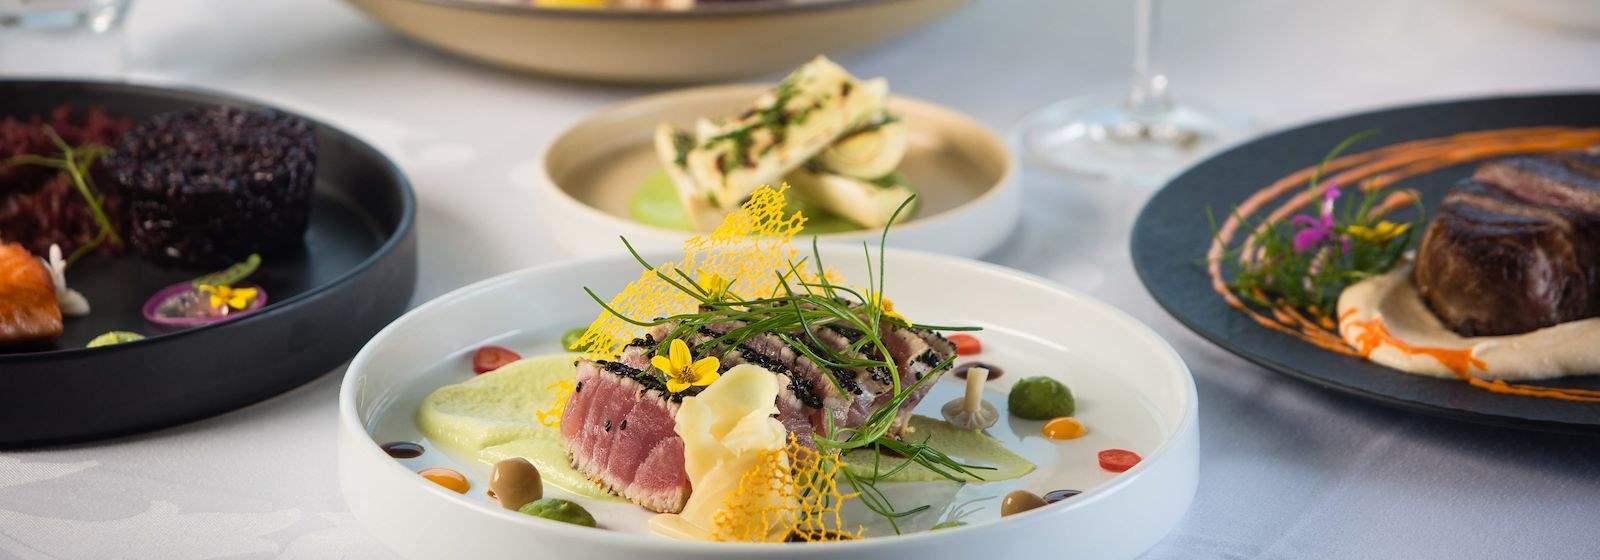 Menu of the Marine Room Restaurant In La Jolla top